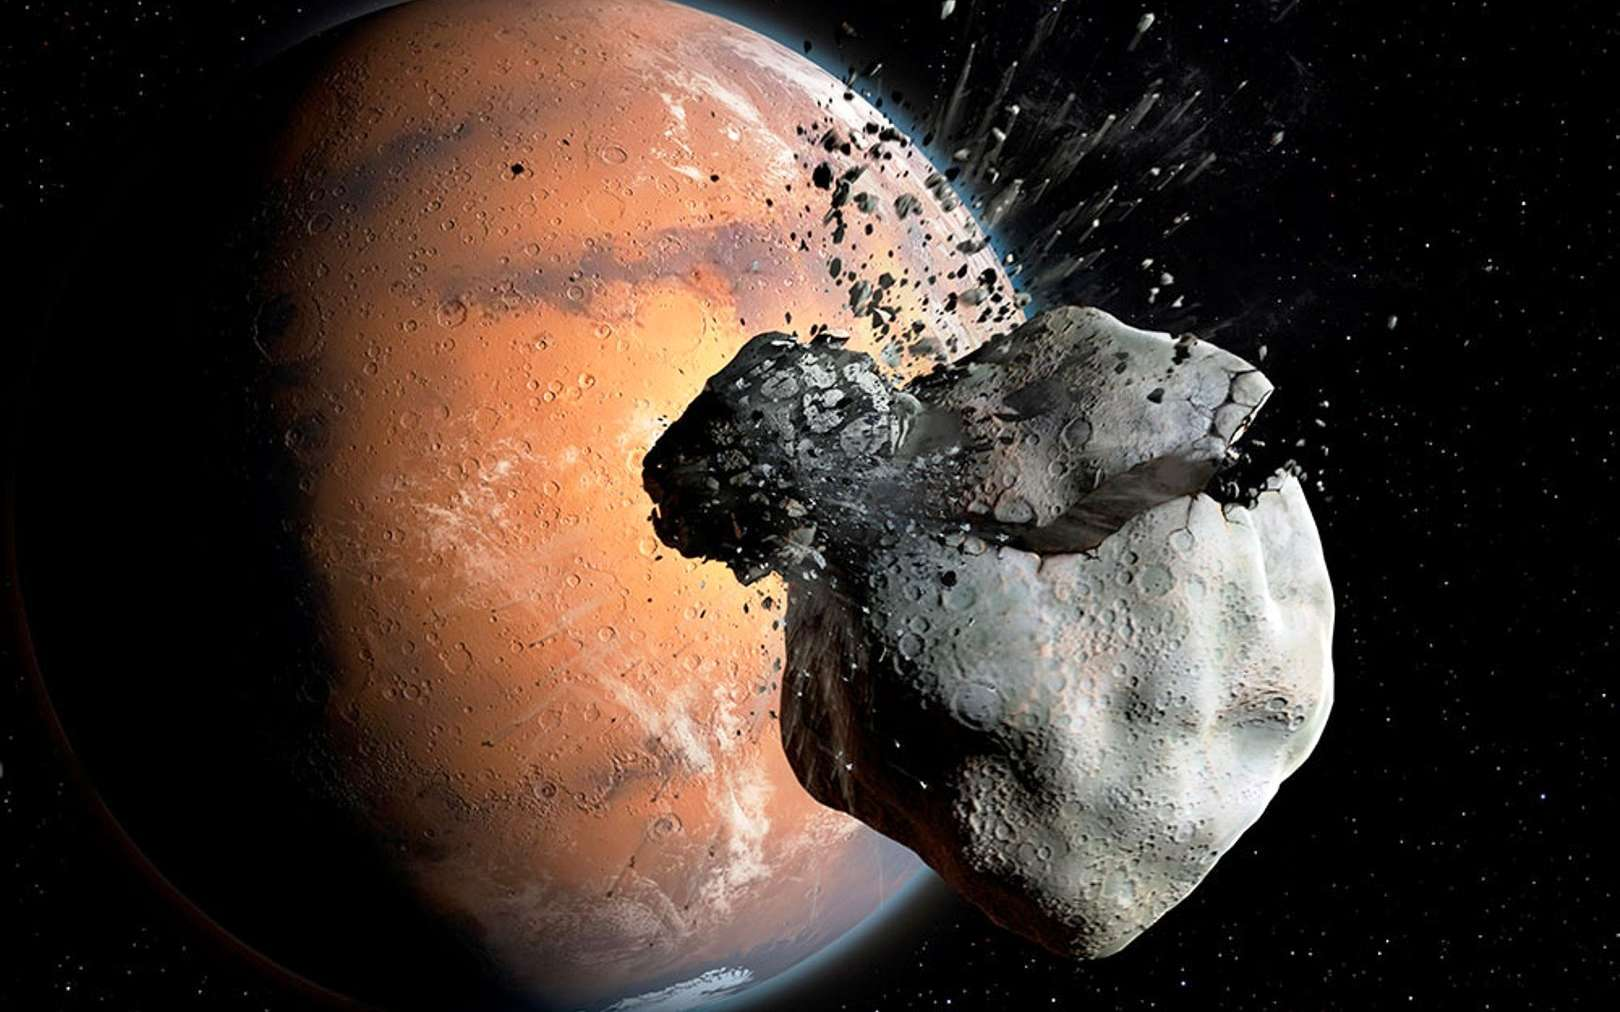 Rebondissement avec l'origine énigmatique de Phobos et Deimos, les lunes de Mars. - Futura